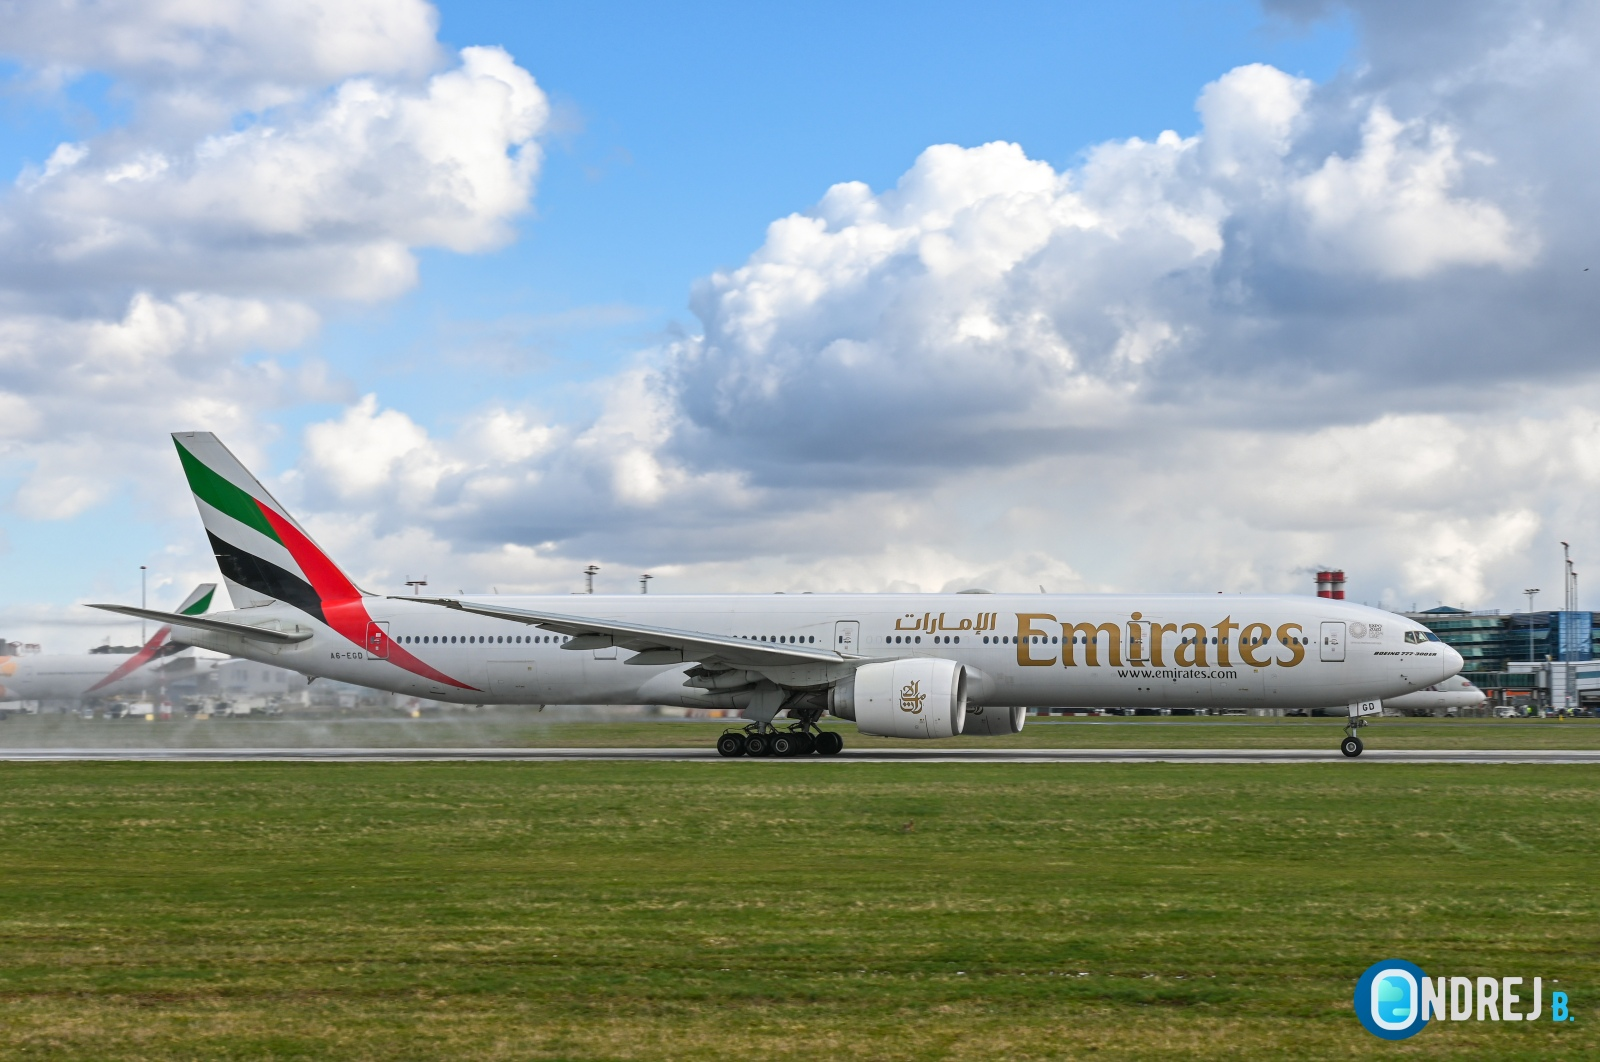 Emirates - Boeing 777 (A6-EGD)